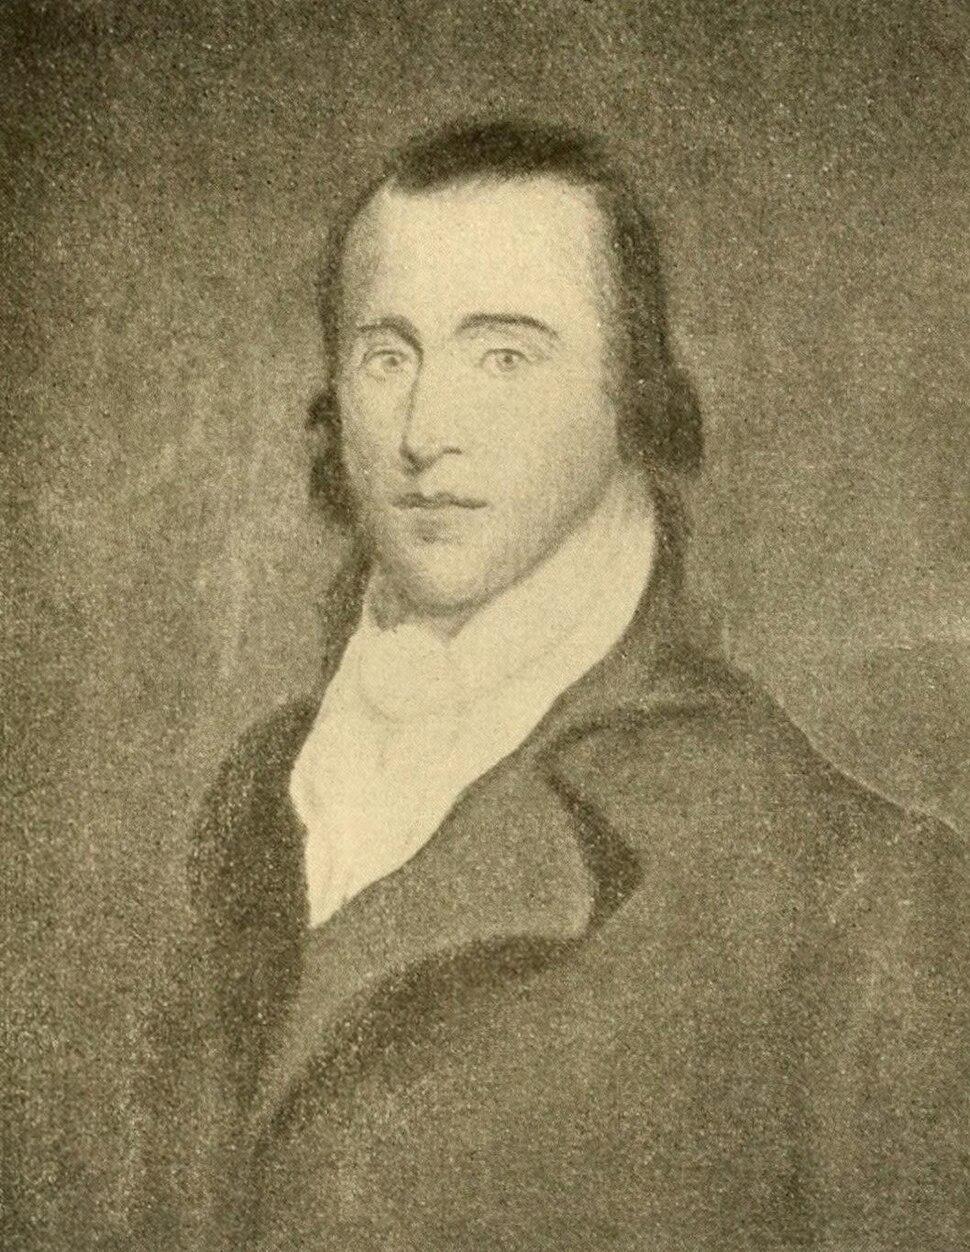 John-Breckinridge-portrait